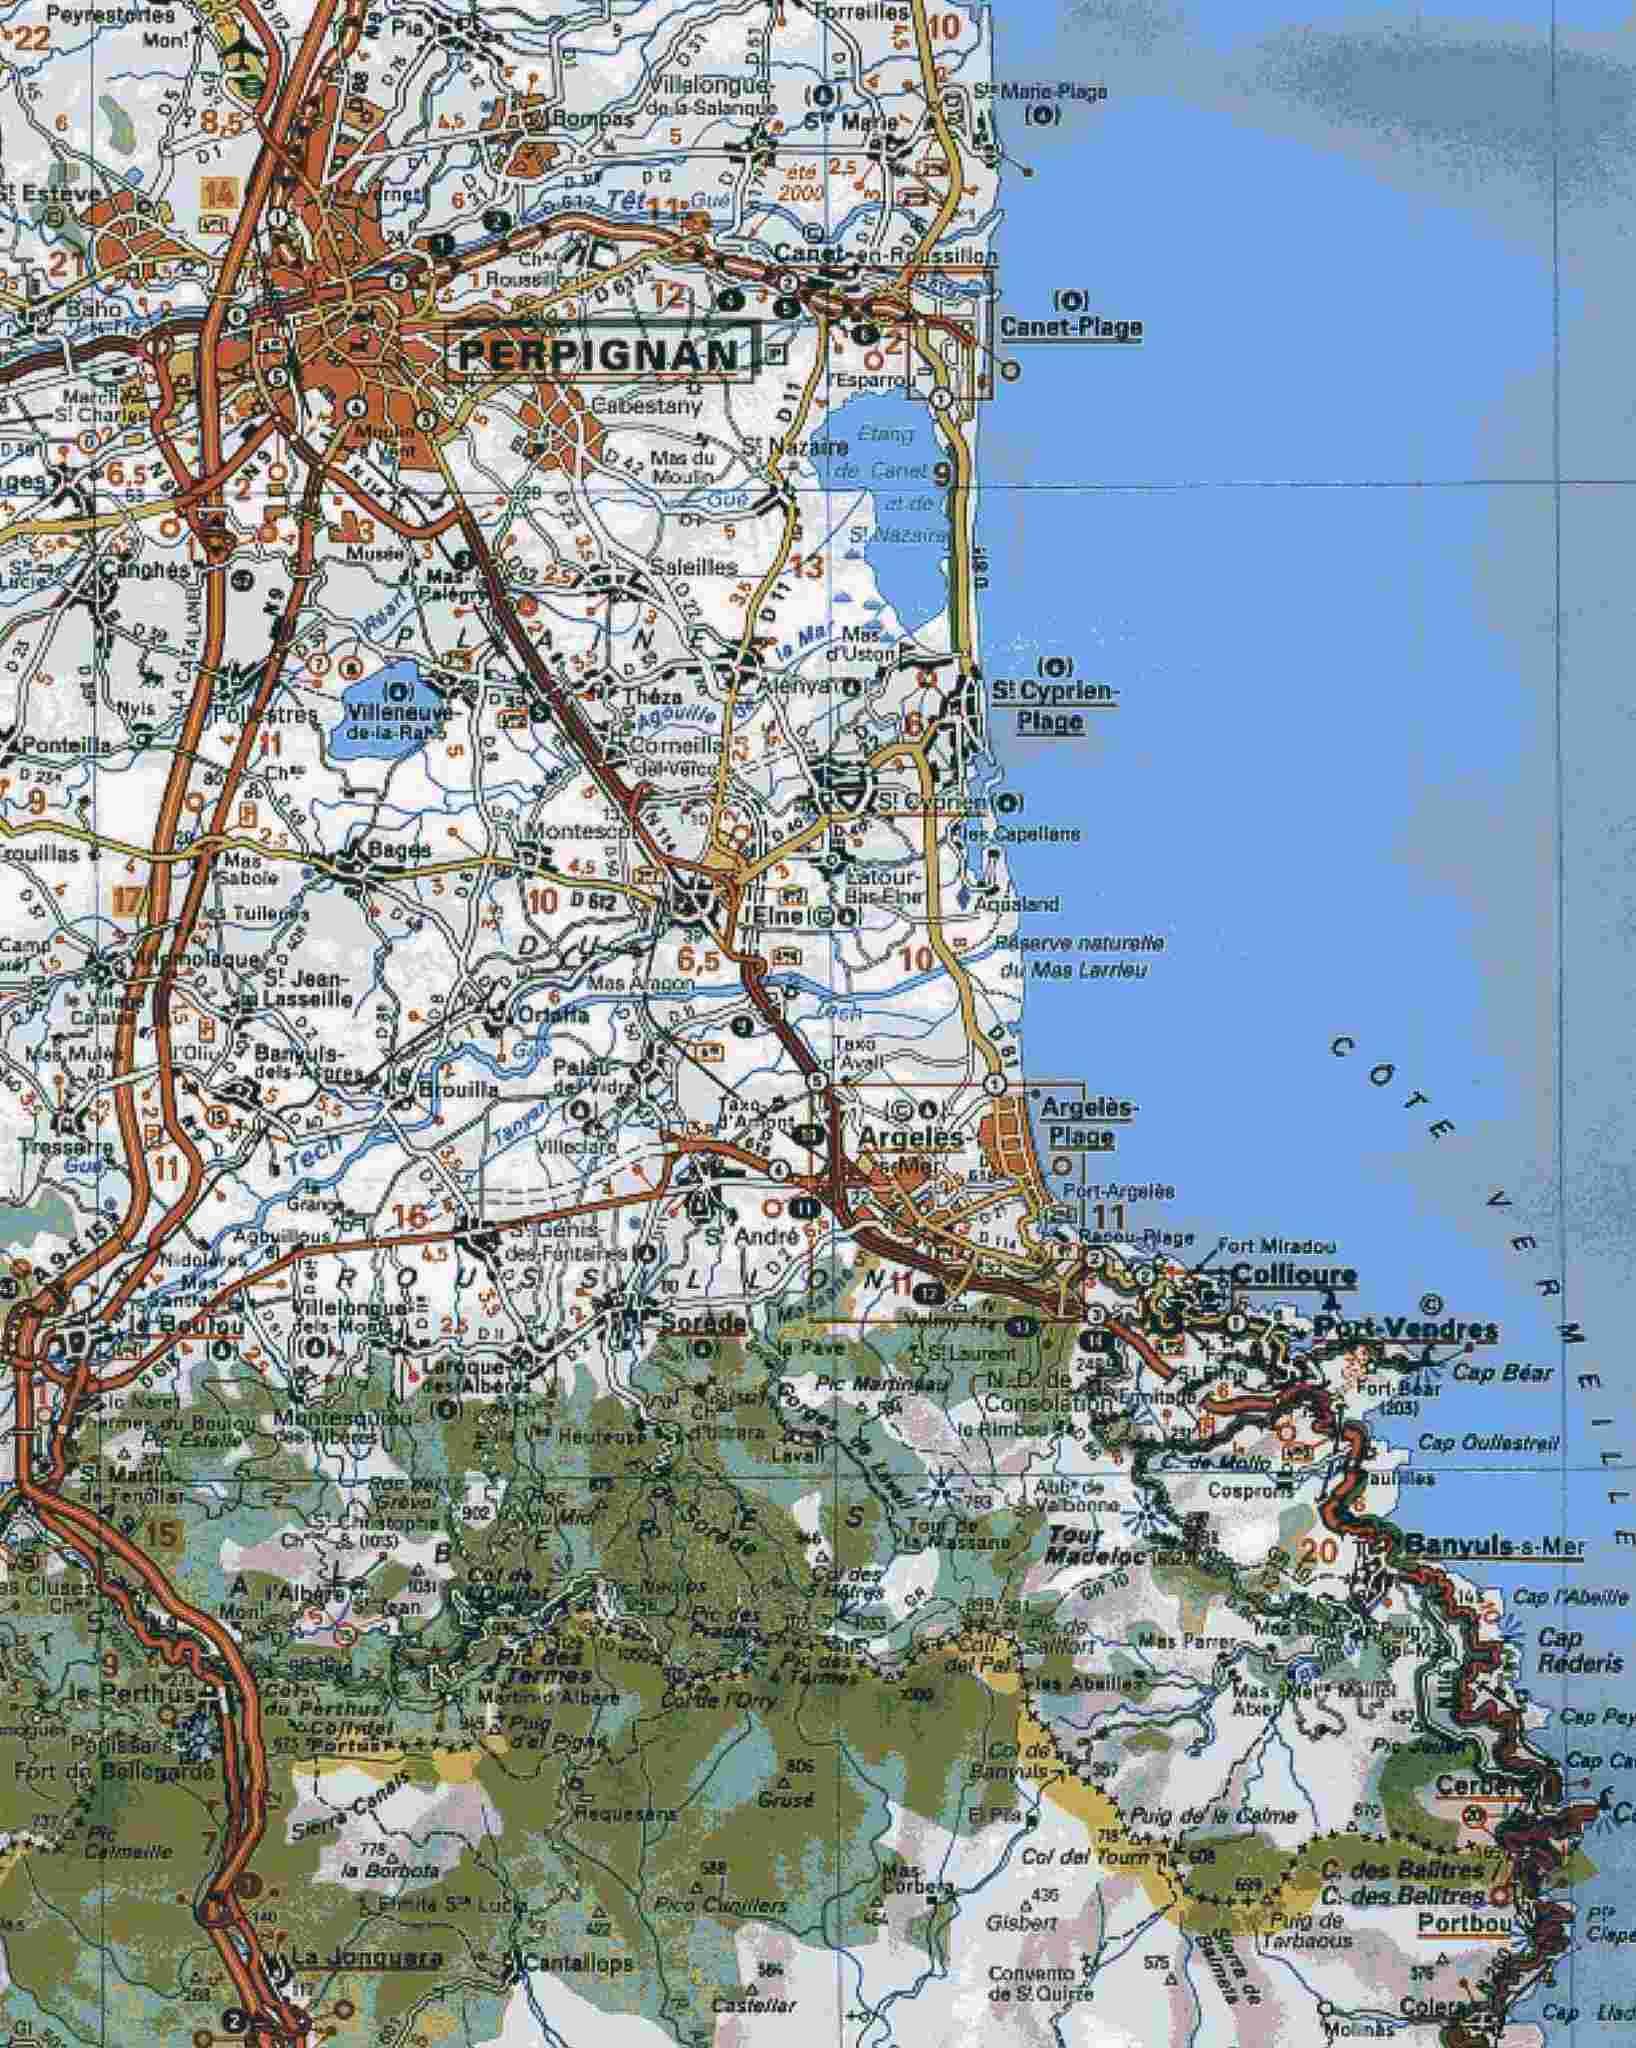 mappa Étang de Canet-Saint-Nazaire 2016 » 42nd La Méditerranéenne (2.1) - 2a tappa » Banyuls › Port Vendres (145 km)